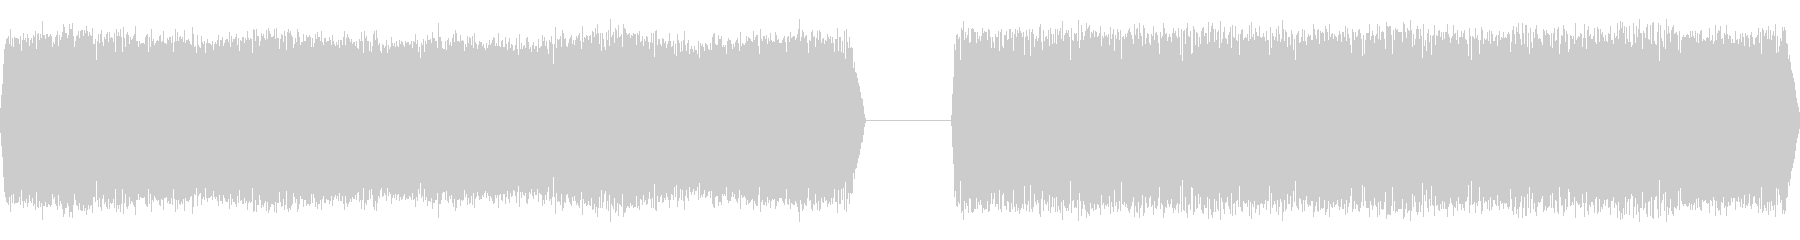 HARMO WAVE、2バージョン...の未再生の波形